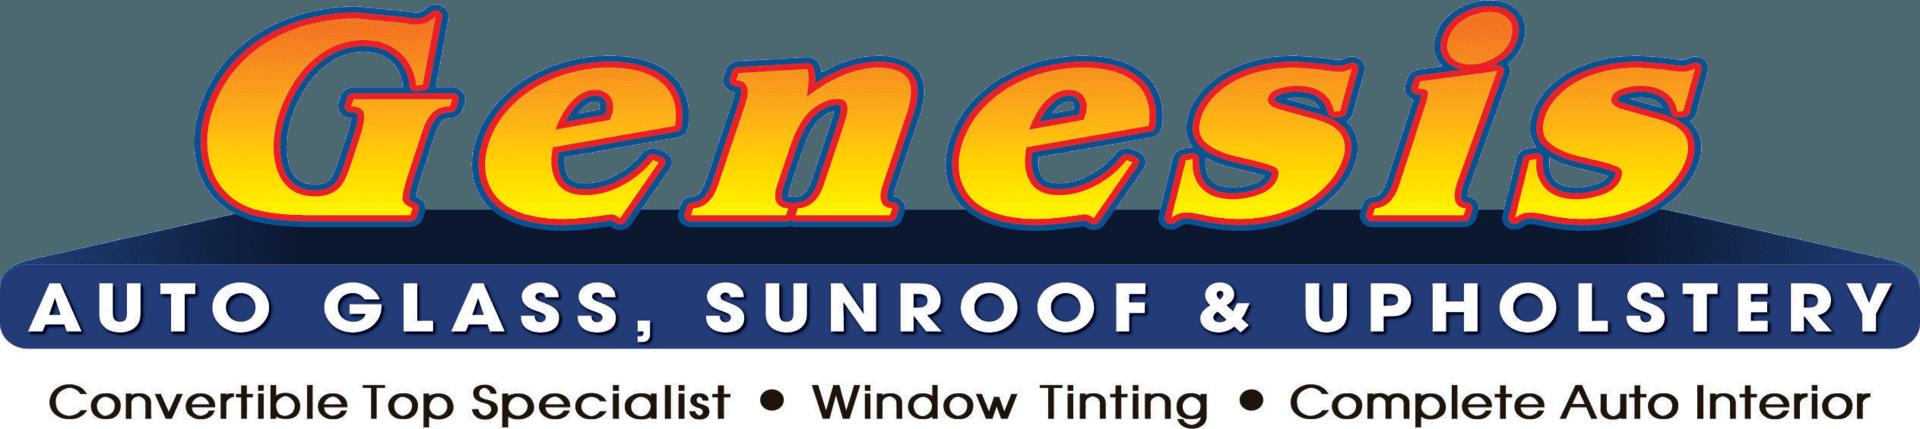 Genesis Auto Glass, Sunroof & Upholstery - Logo